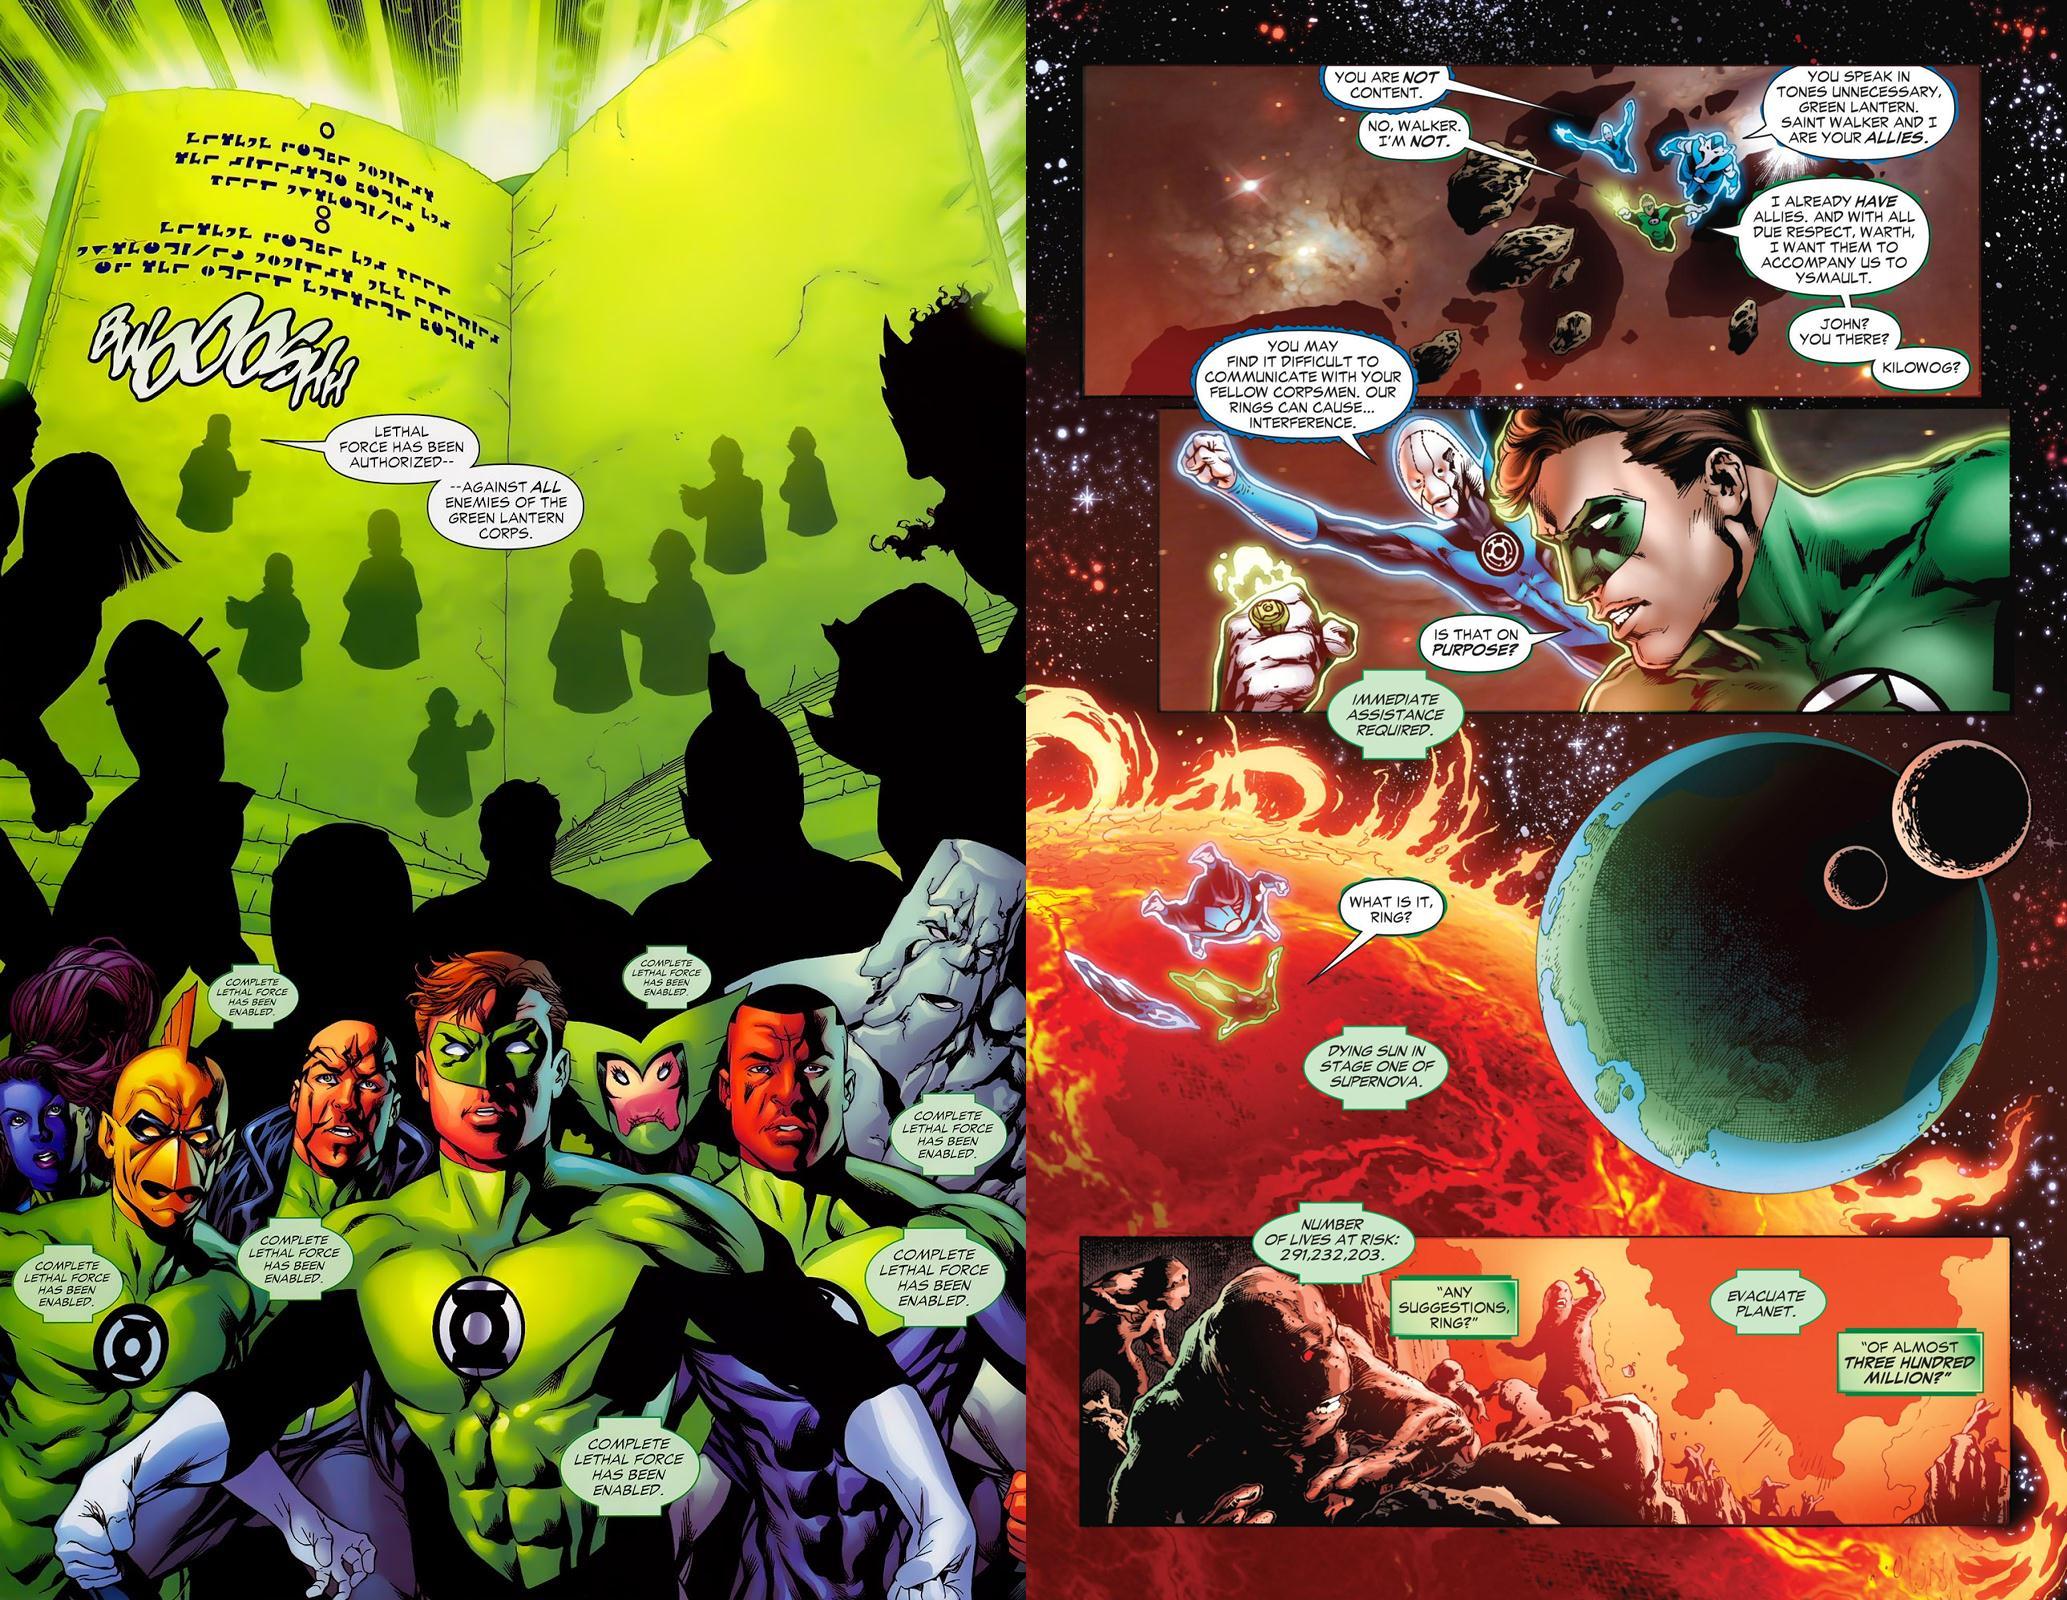 Green Lantern - Rage of the Red Lanterns review